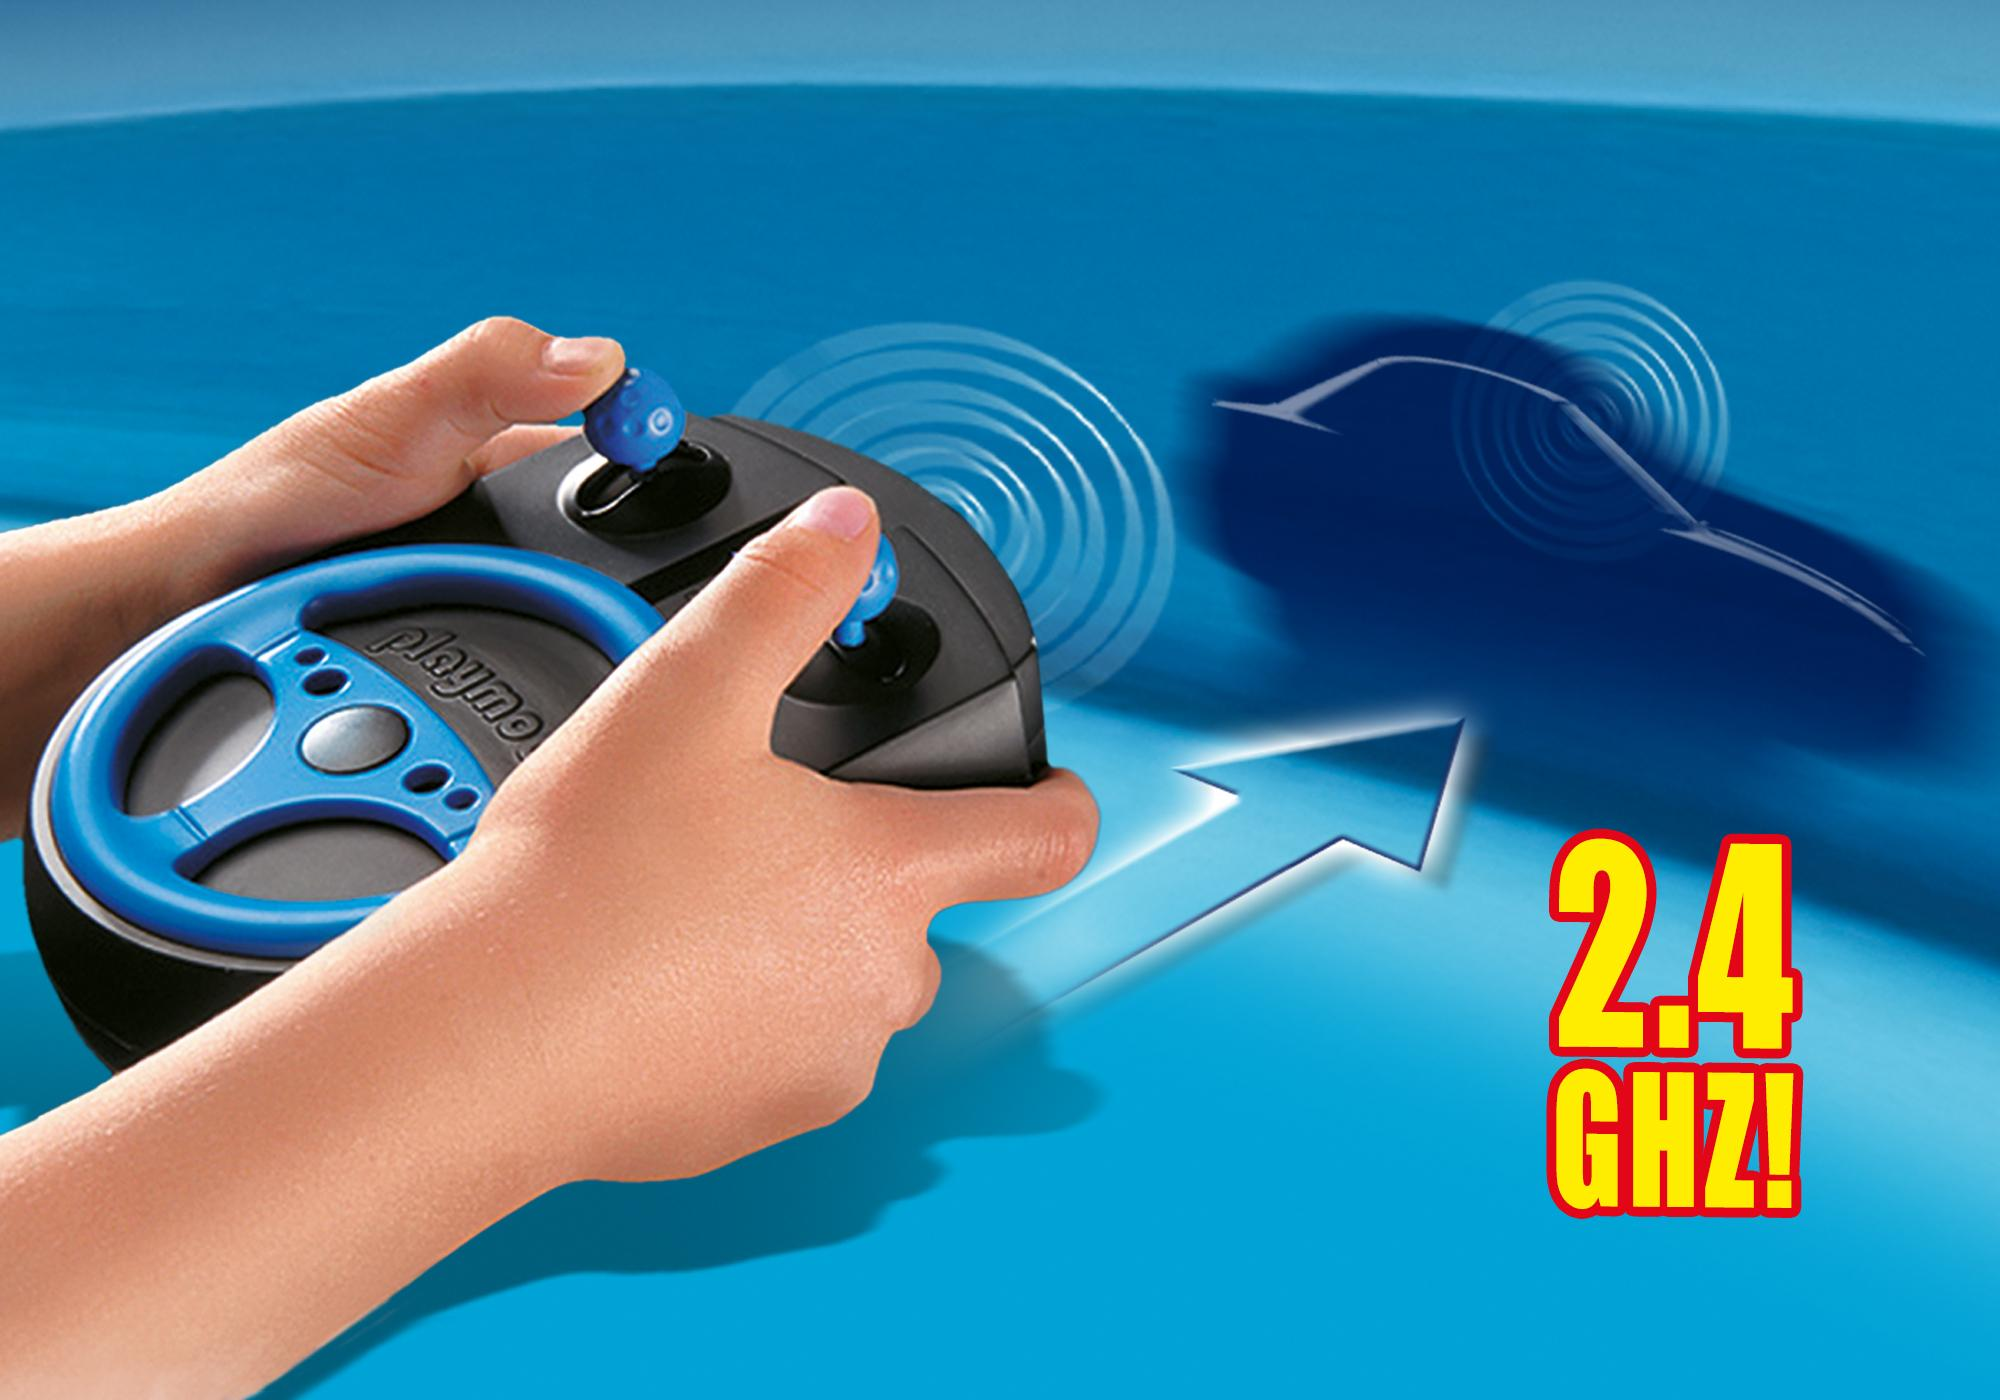 http://media.playmobil.com/i/playmobil/6914_product_extra2/Module de radiocommande 2,4 GHz